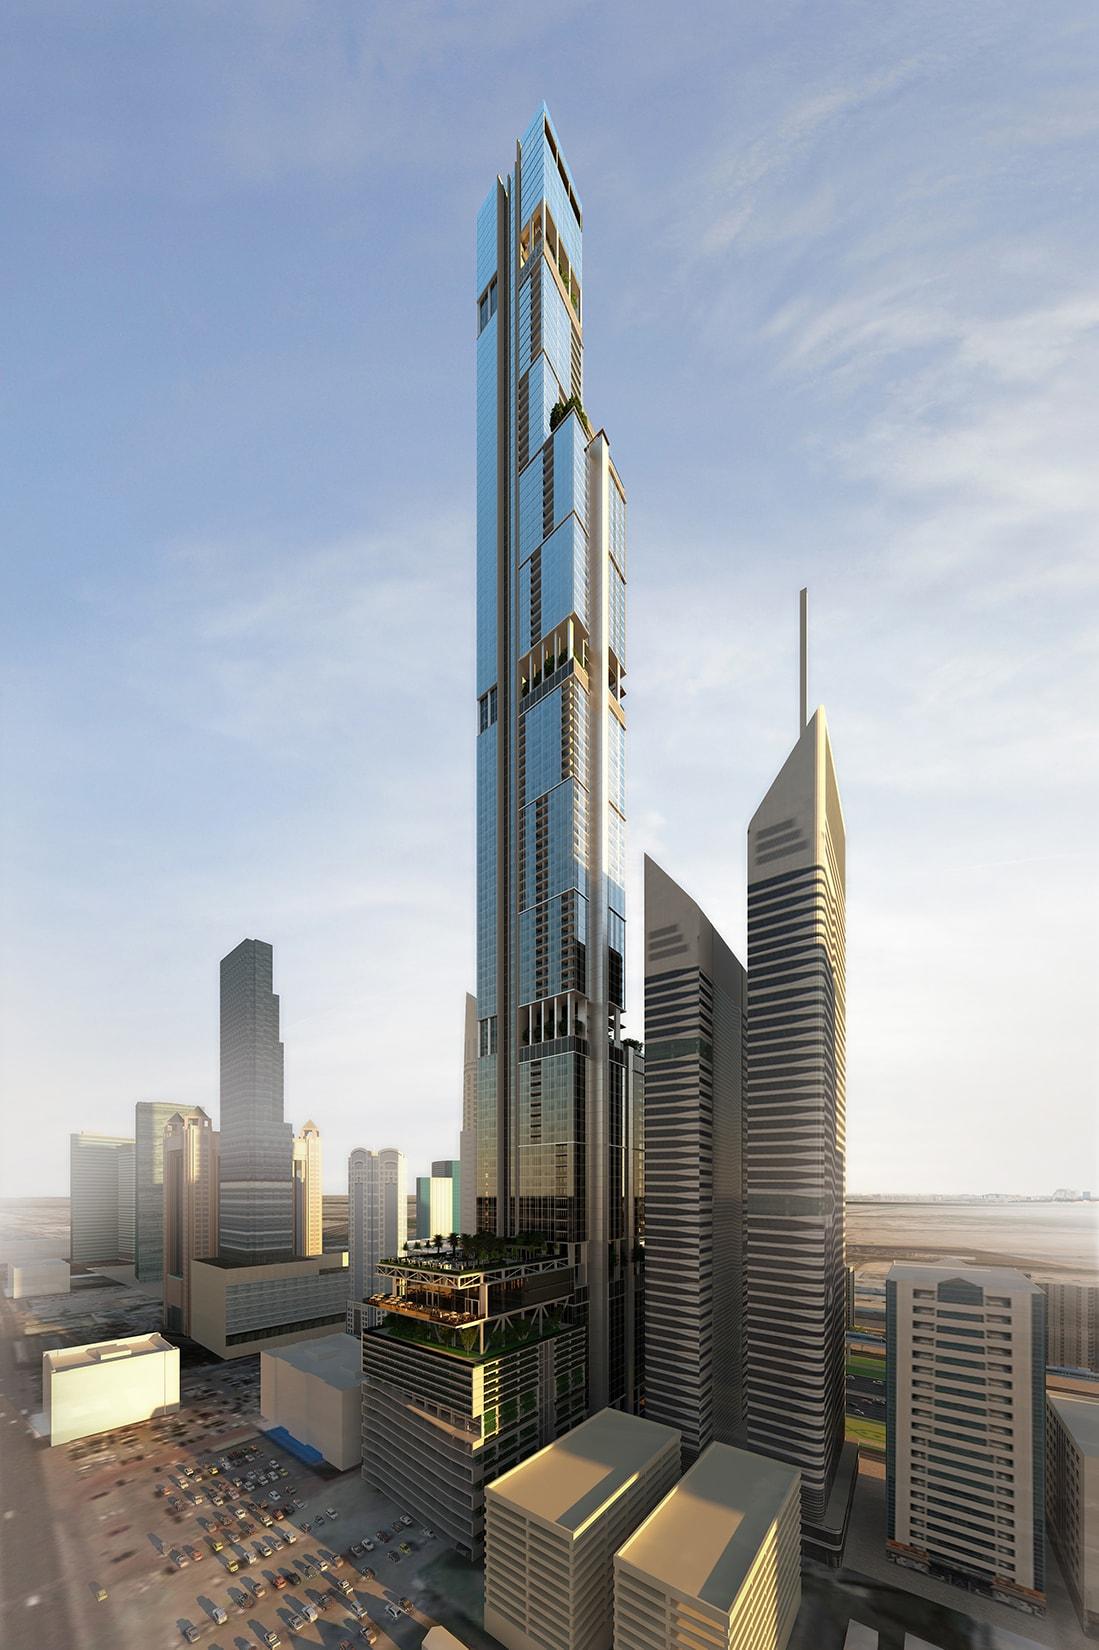 Entisar Tower by Quezada Architecture (Fred Quezada, Cecilia Quezada, Ed Tingley)